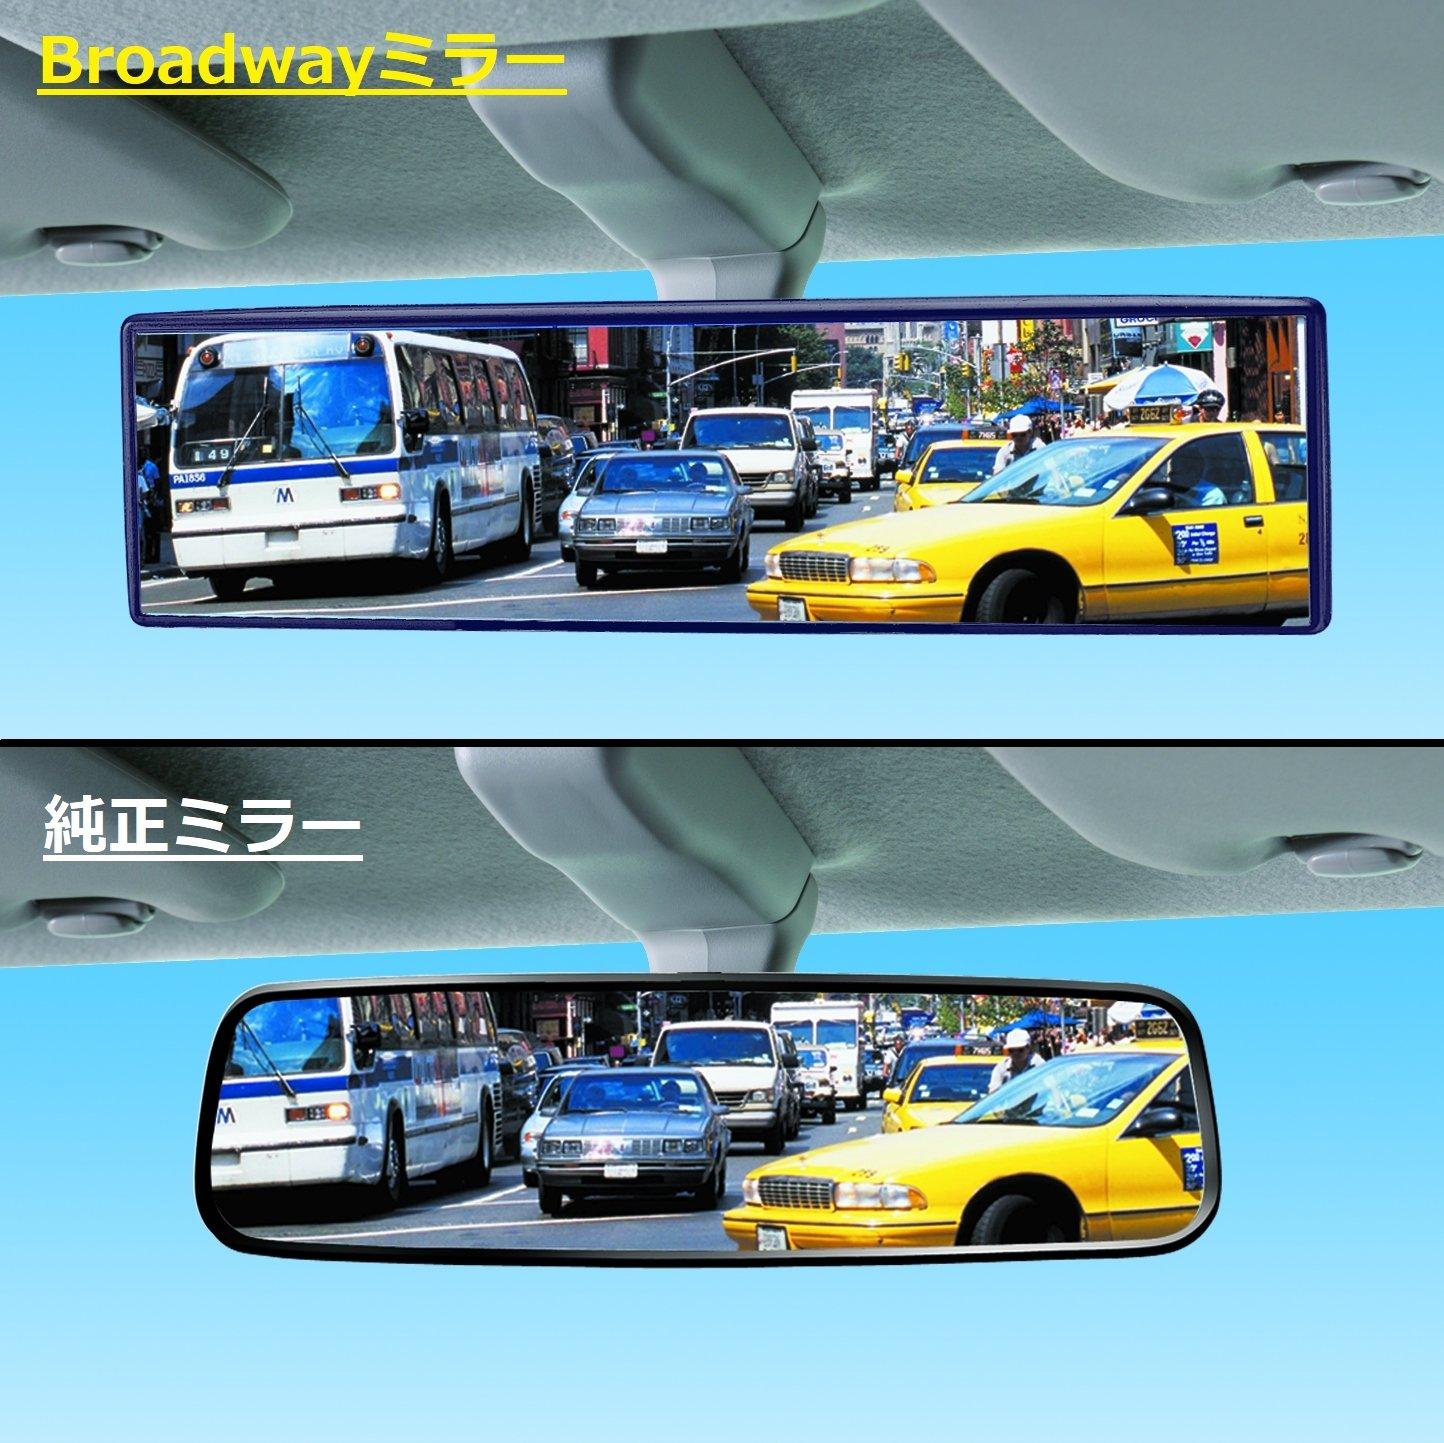 Broadway BW842 240mm Type-A Flat Mirror